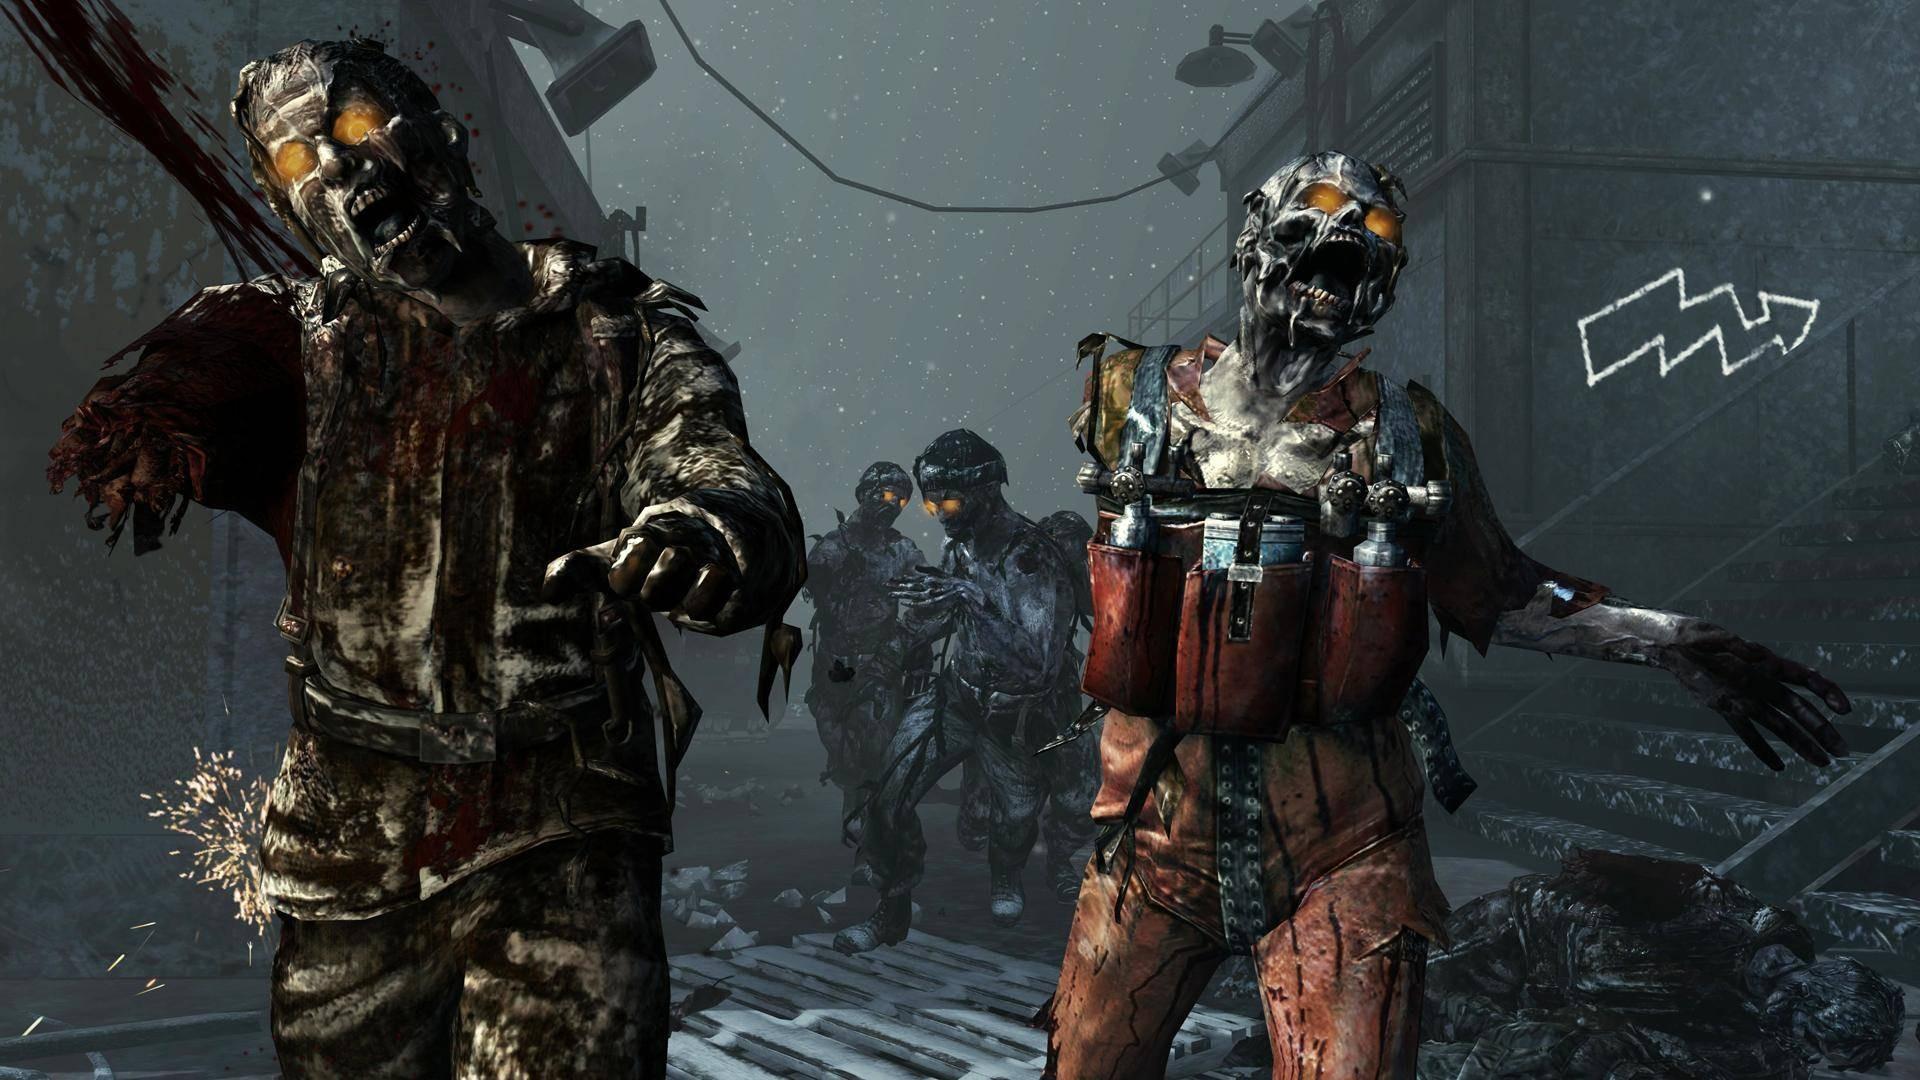 Call Of Duty: Black Ops II HD Wallpaper